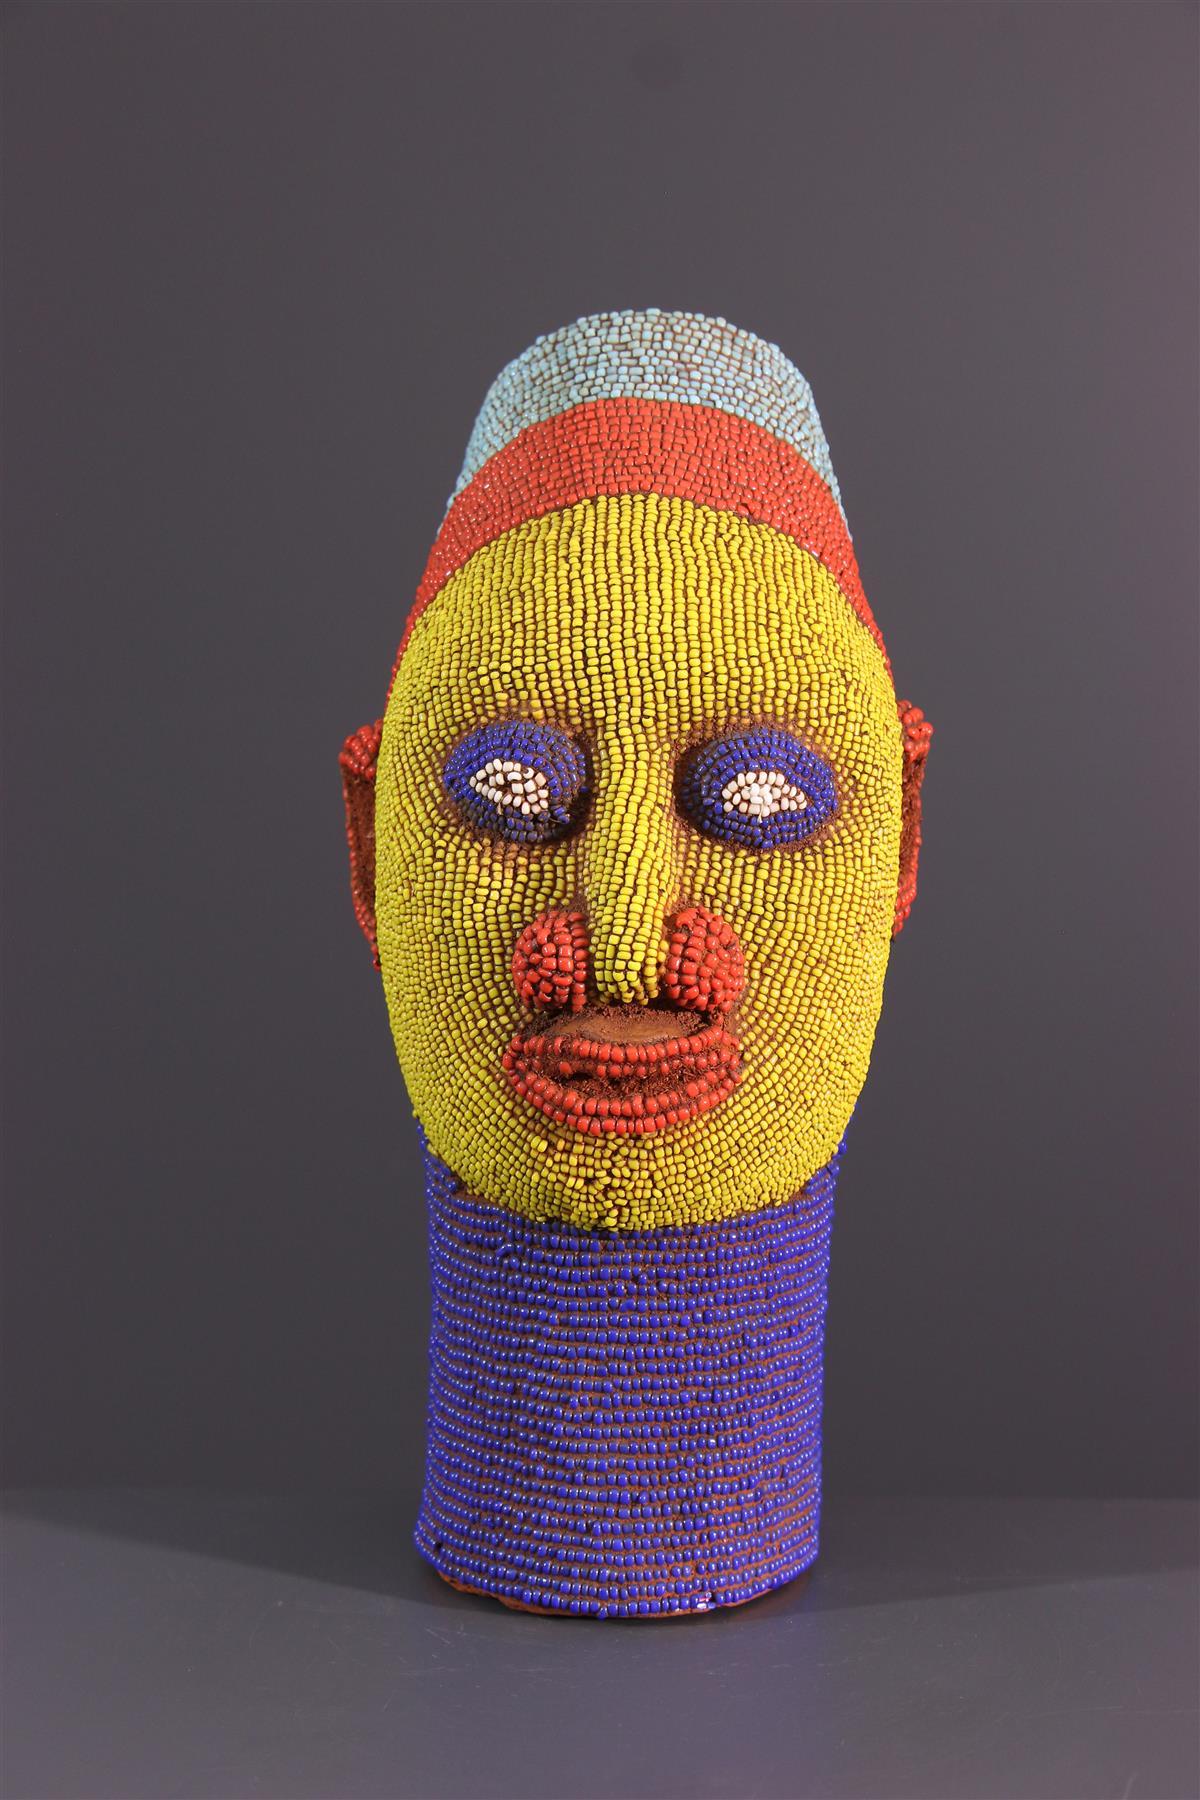 Beaded head - African art